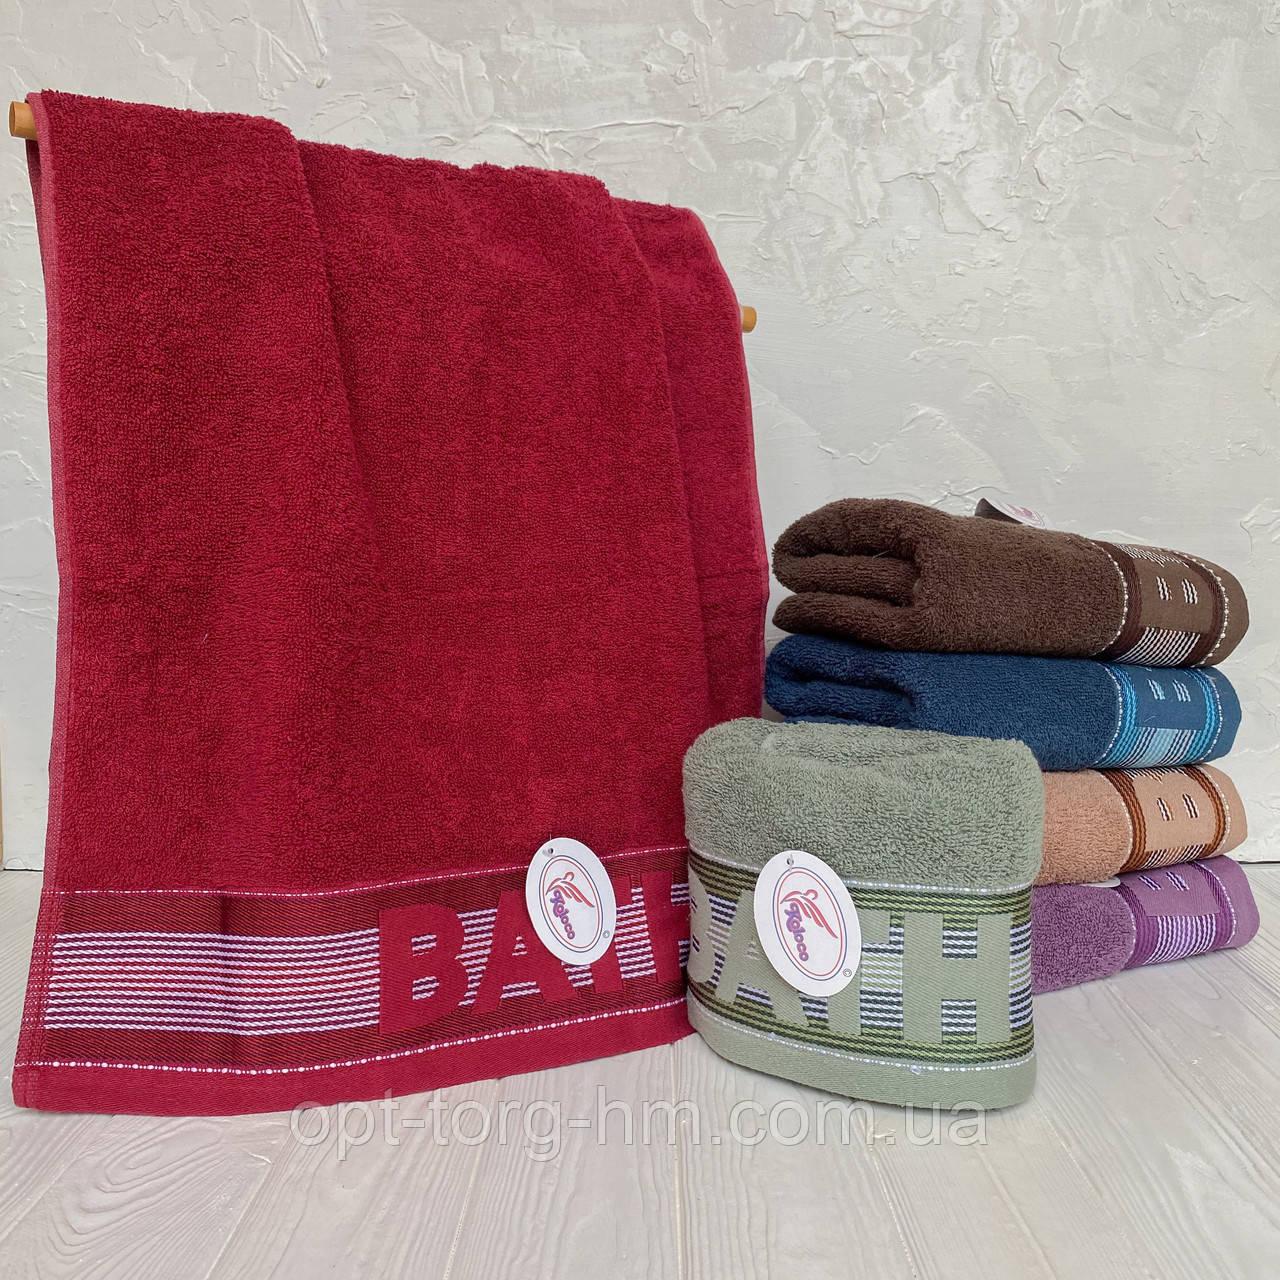 Полотенца bath